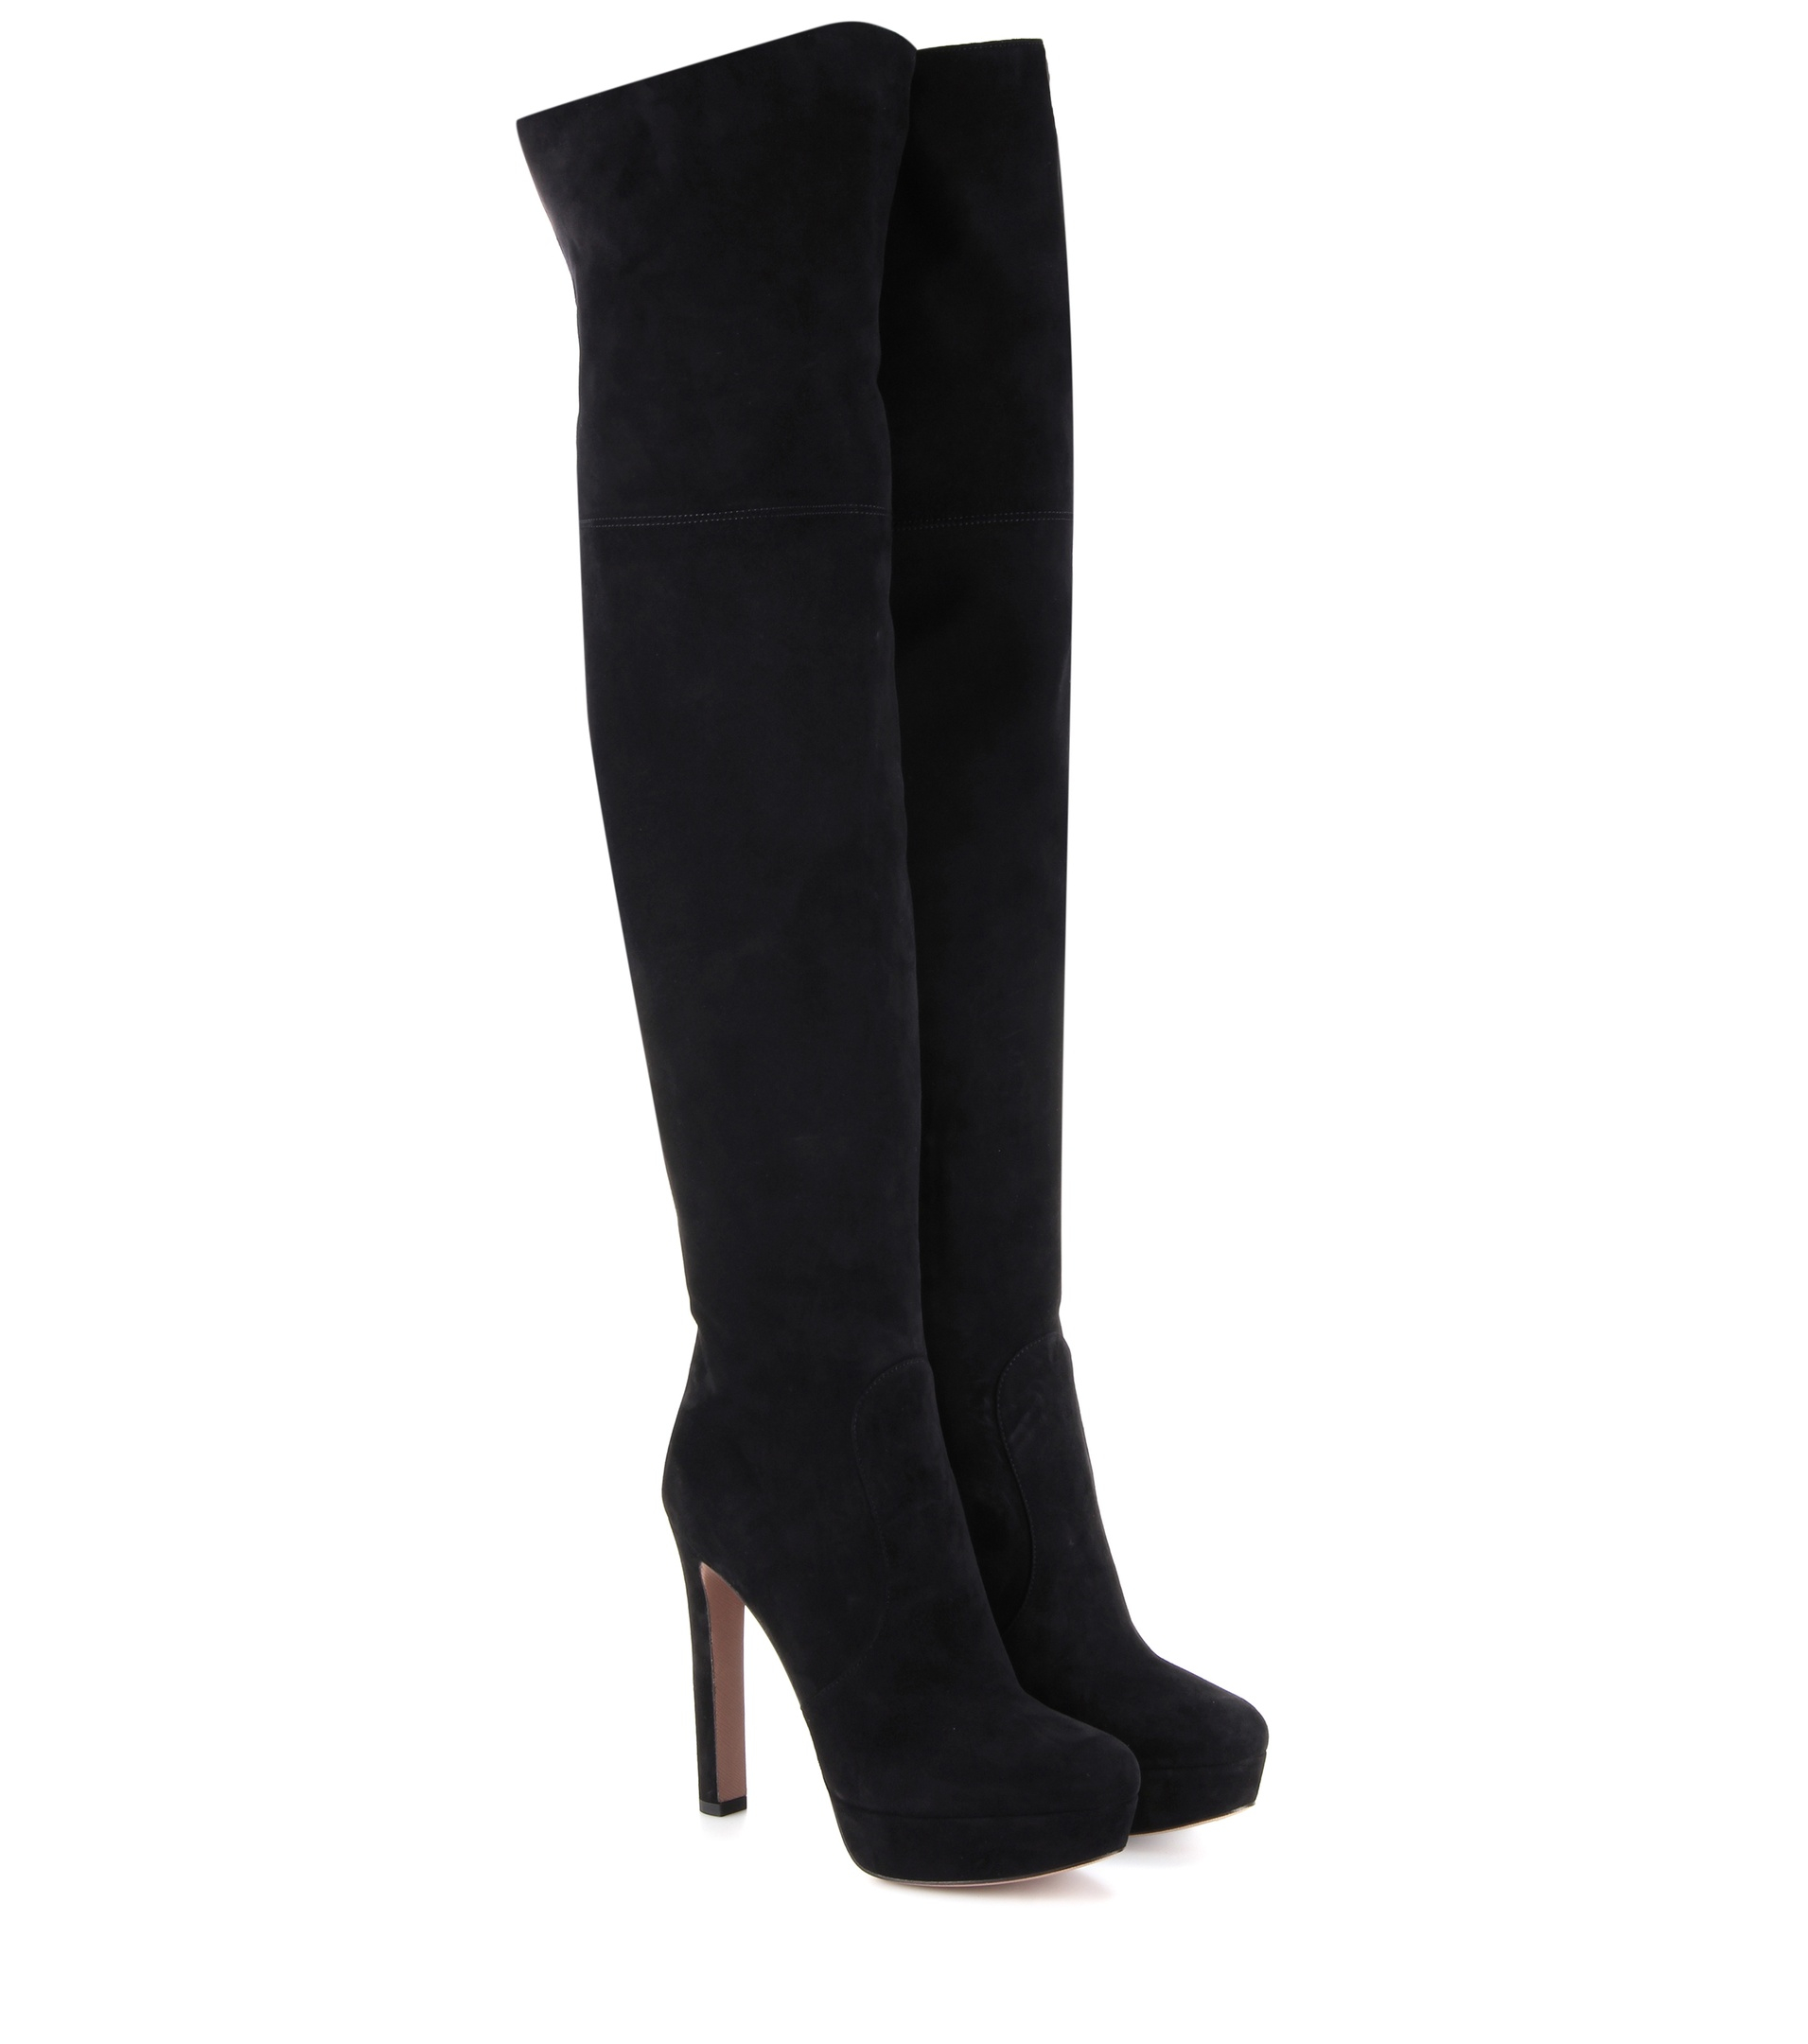 prada the knee suede platform boots in black lyst